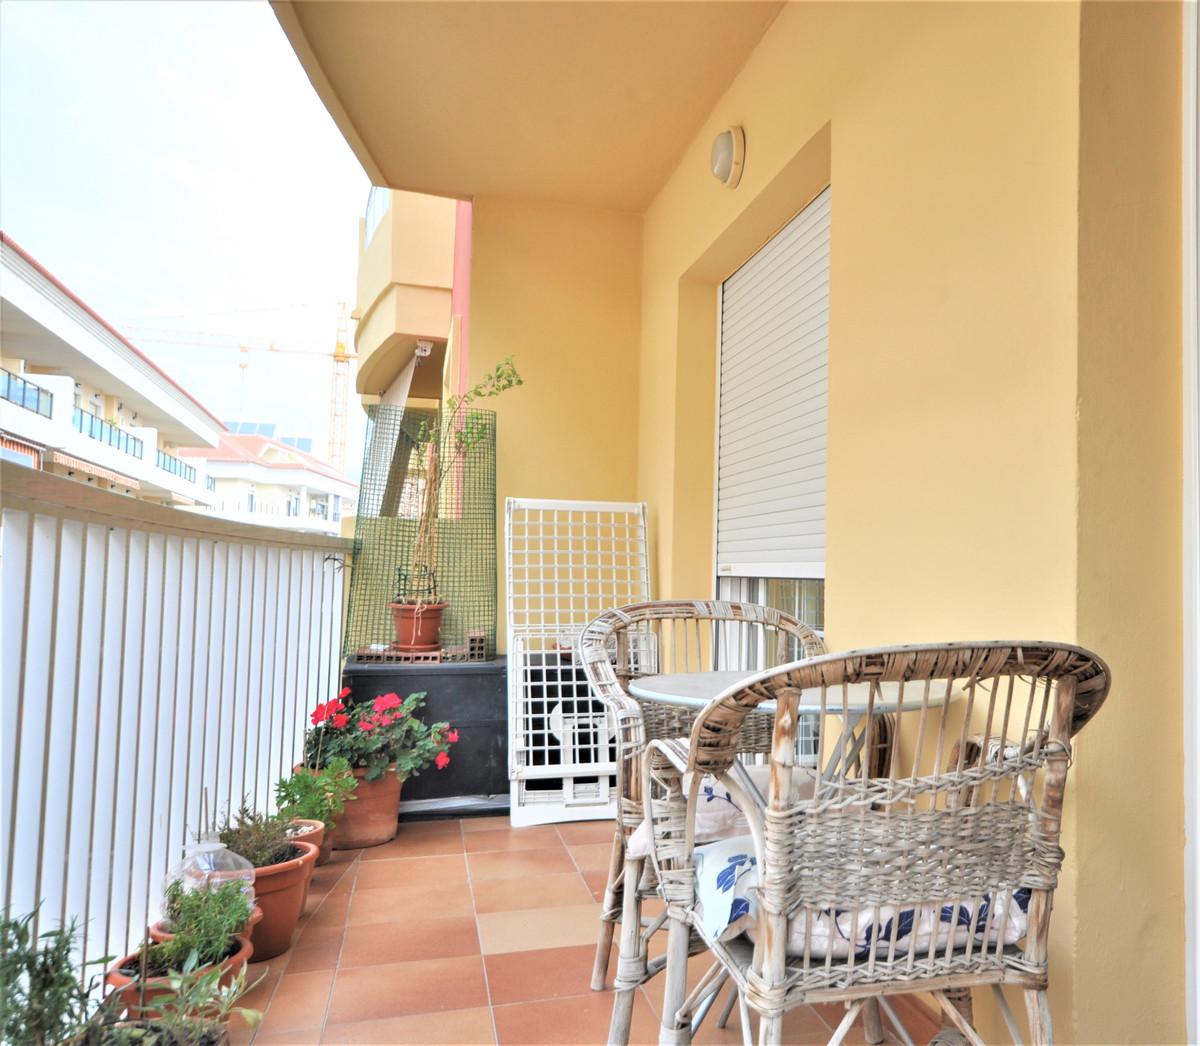 2 Bedroom Middle Floor Apartment For Sale Manilva, Costa del Sol - HP3749305